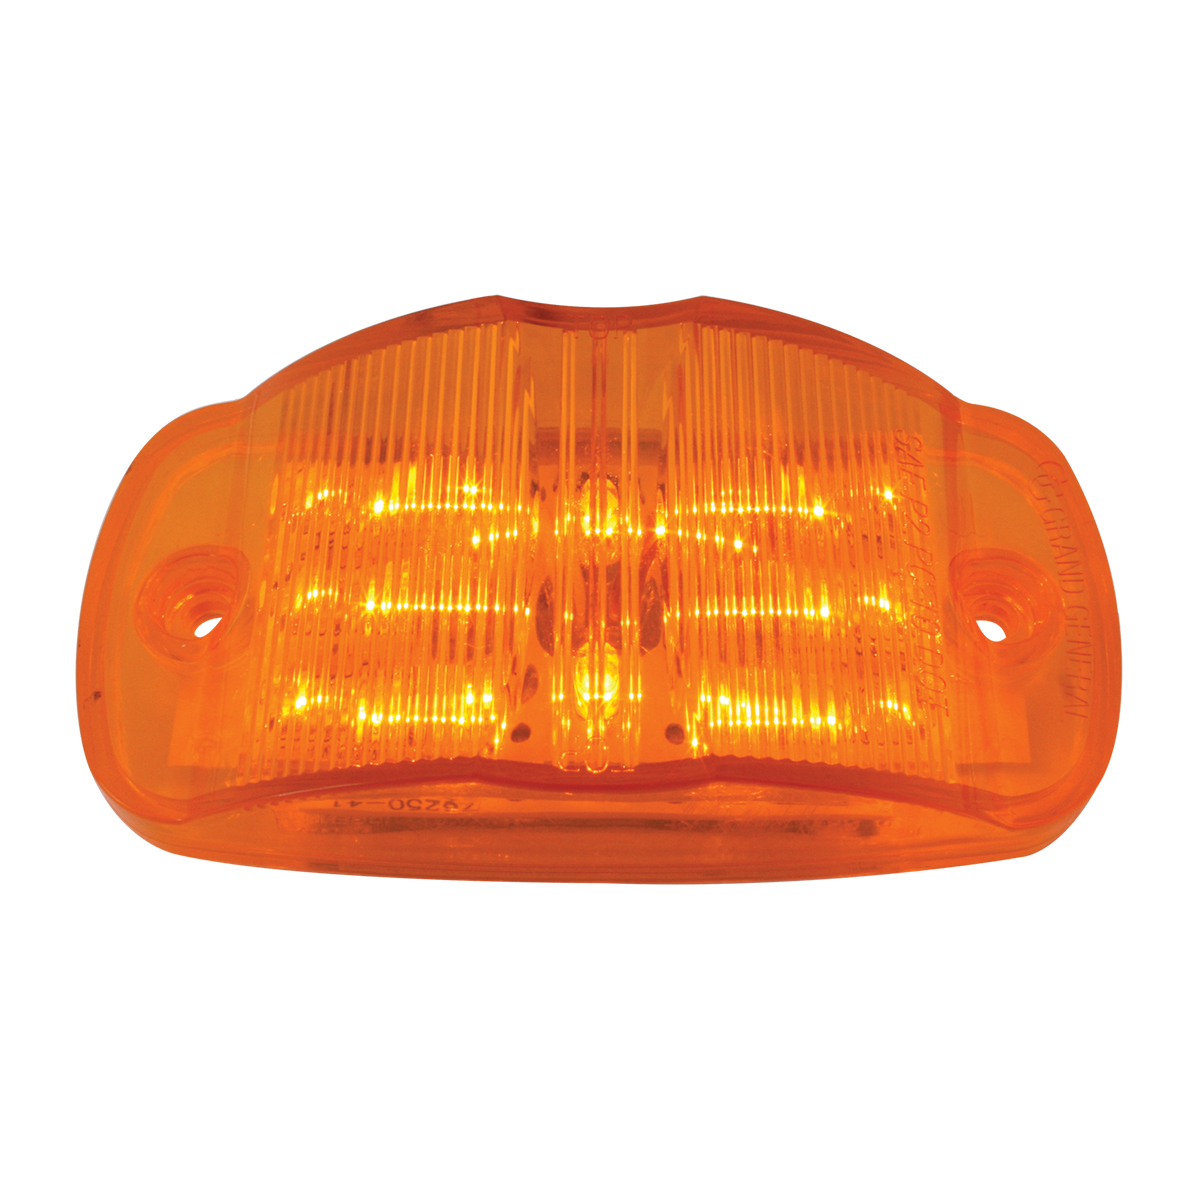 Rectangular Camel Back Wide Angle LED Marker Light in Amber/Amber